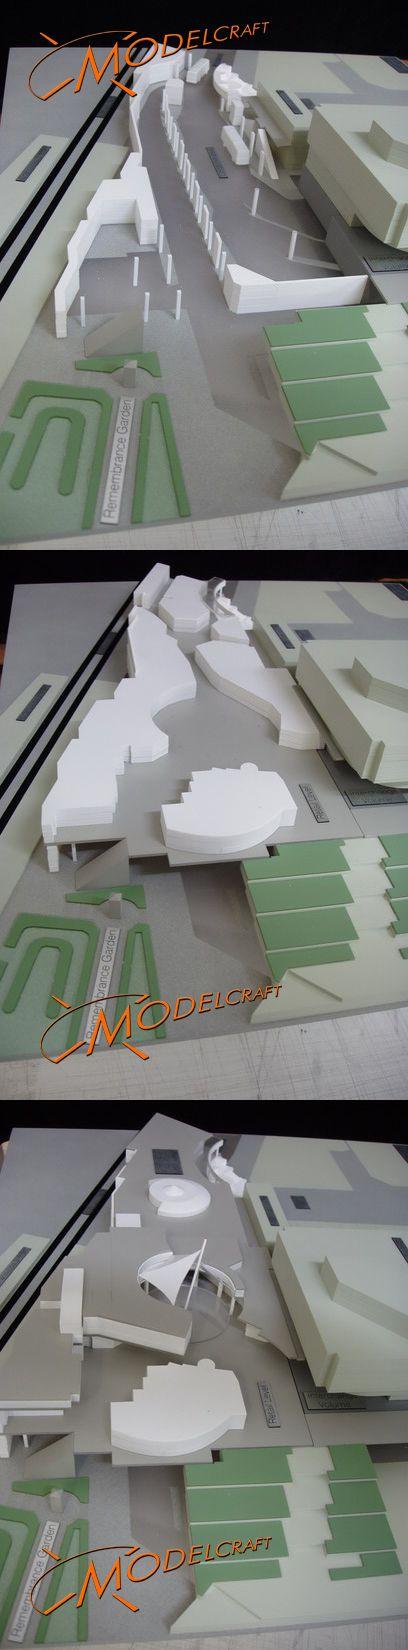 1:300 Chatswood Interchange. Architectural Model by Modelcraft (NSW) Pty Ltd